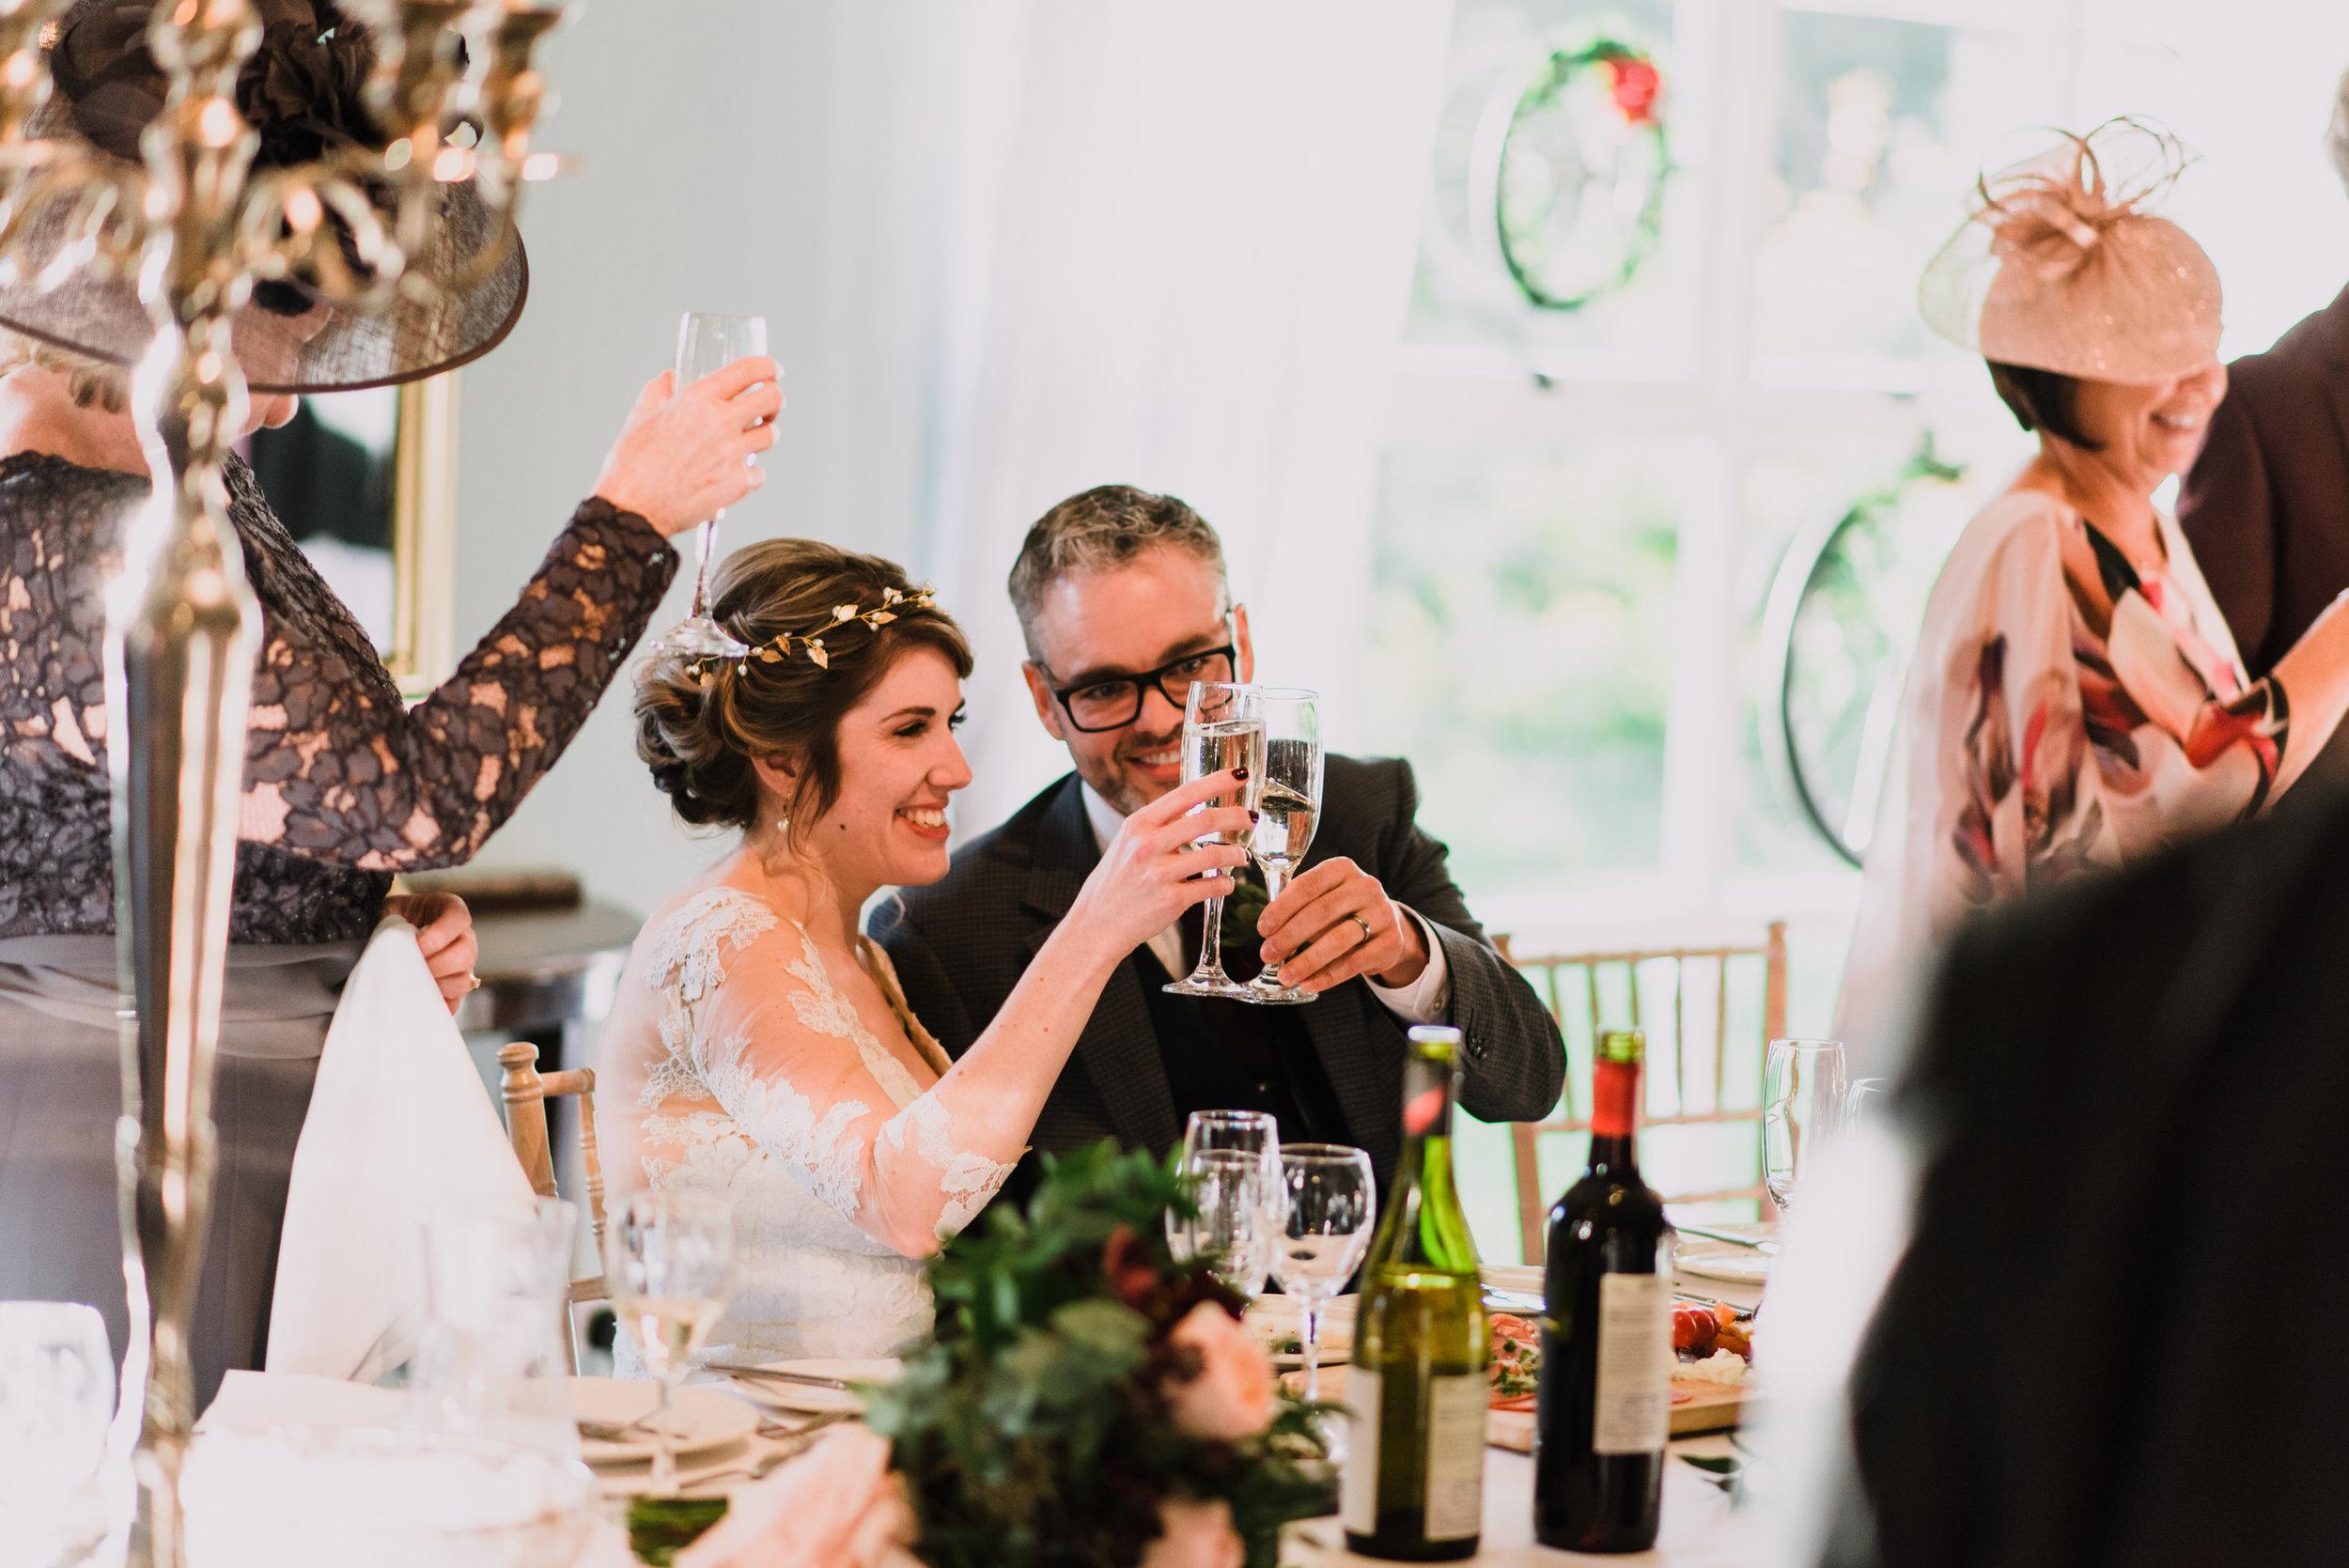 lissanoure castle wedding, northern ireland wedding photographer, romantic northern irish wedding venue, castle wedding ireland, natural wedding photography ni (118).jpg